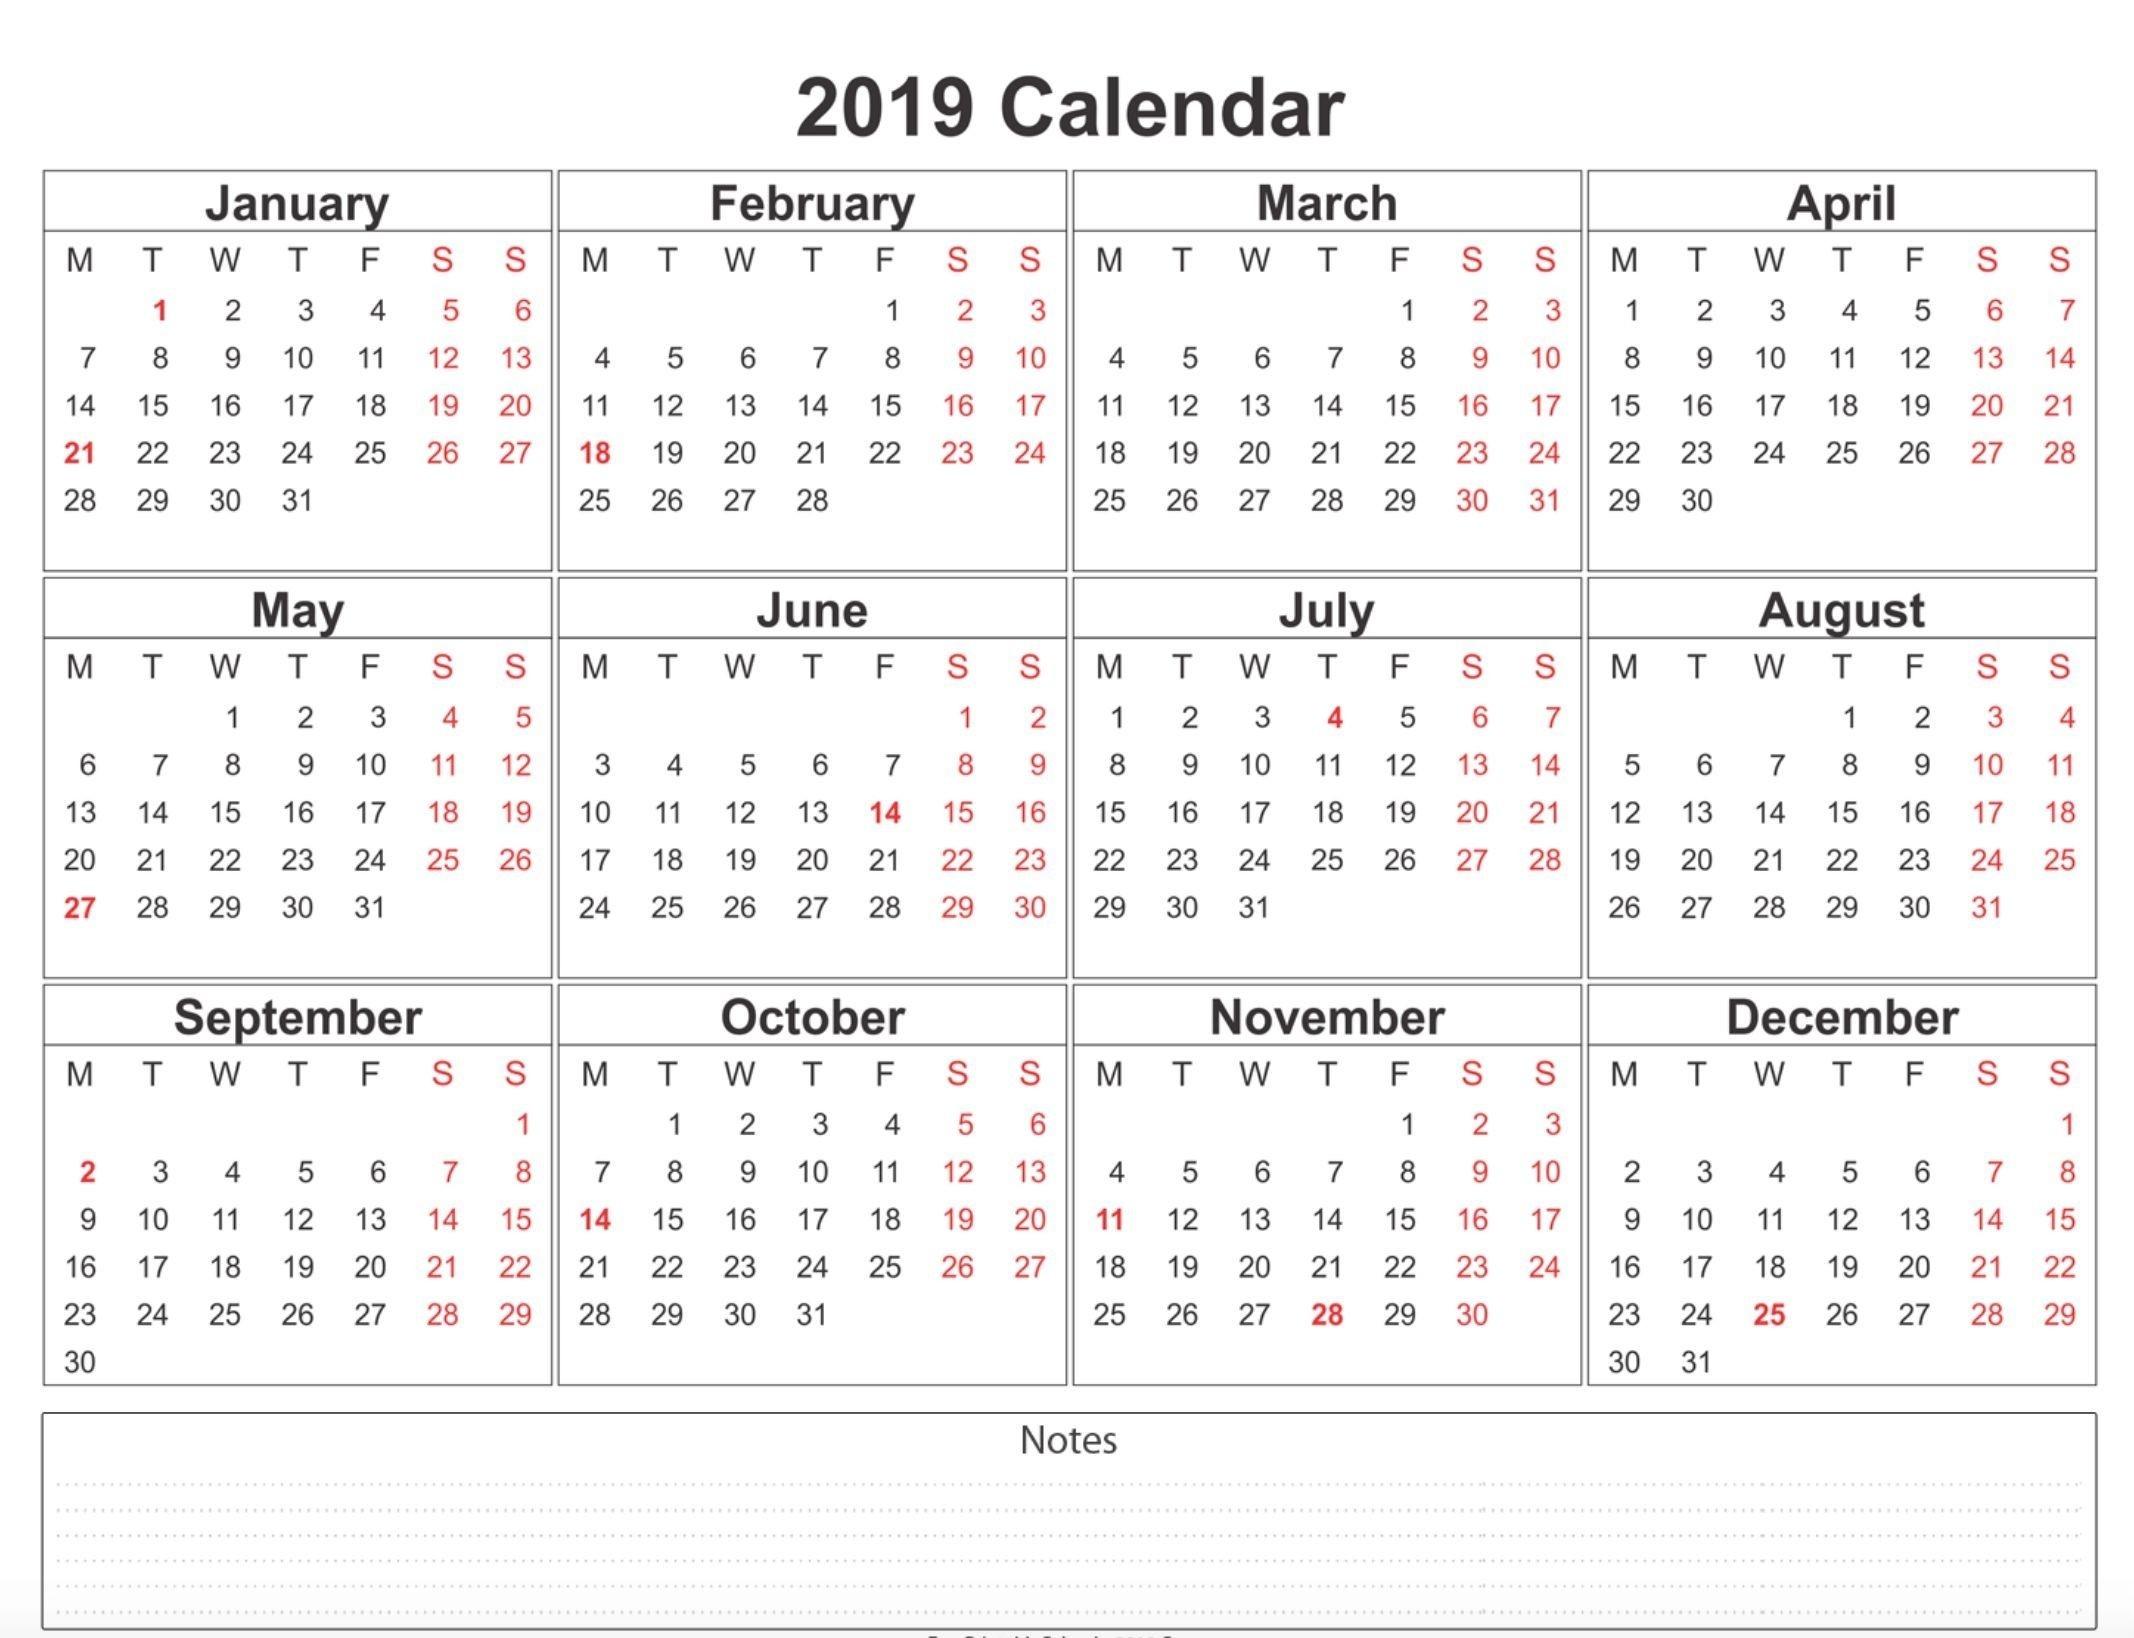 2019 Weekly Calendar Printable | 12 Month Calendar Printable  Free Printable Calendar 12 Months